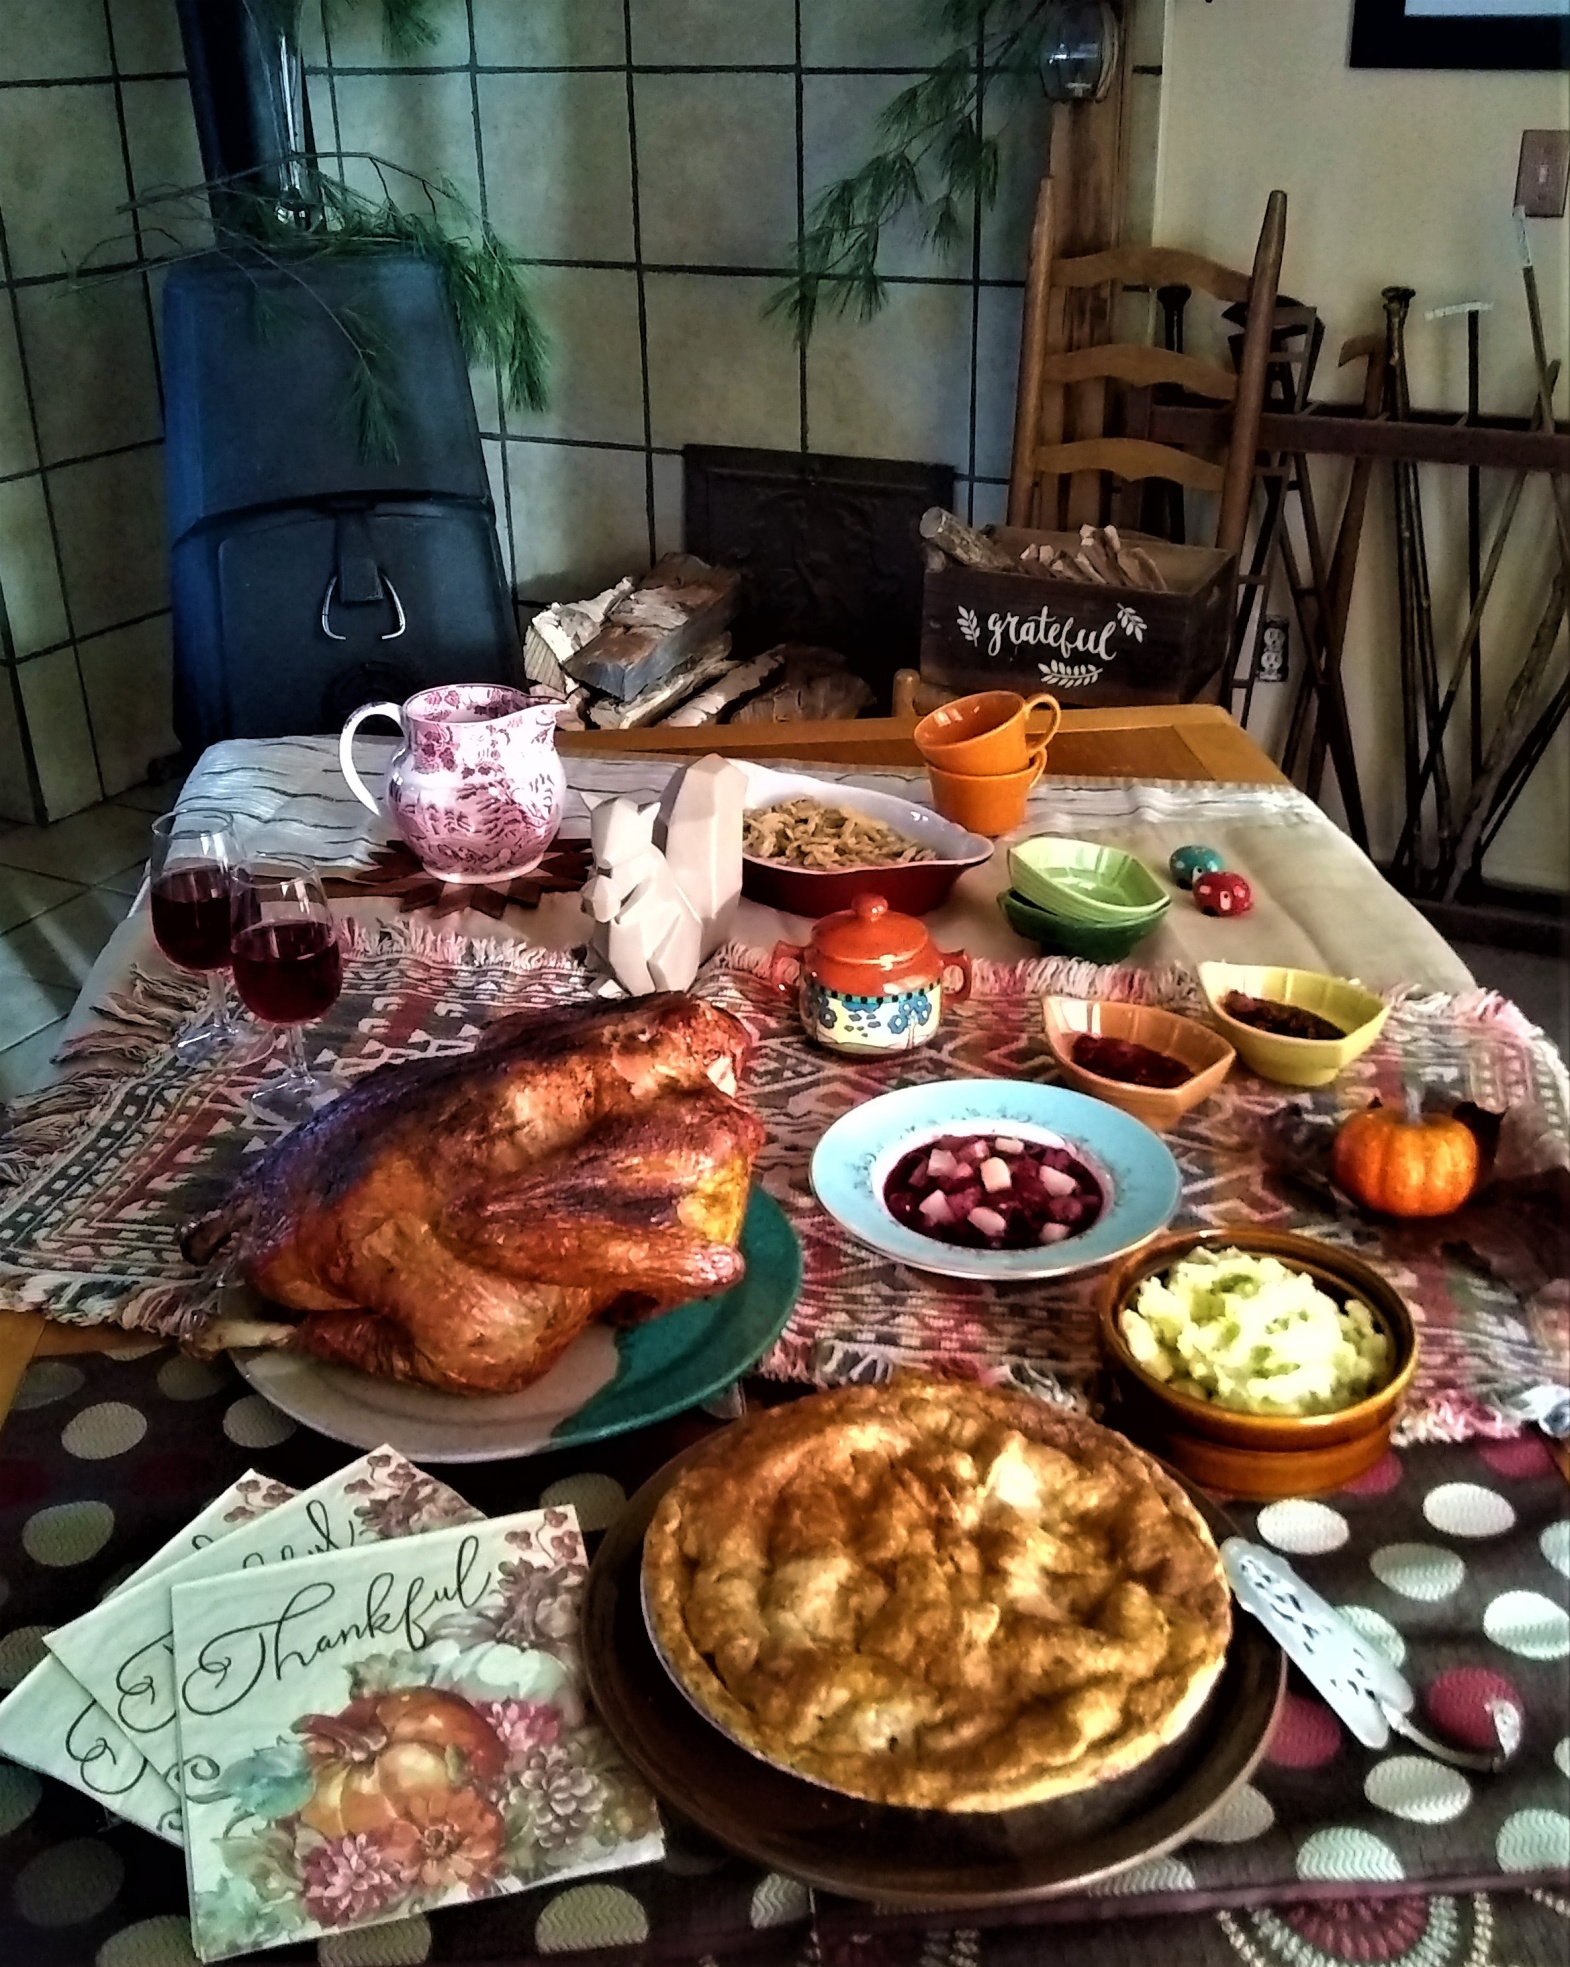 Full Thanksgiving table Pynck 11-20.jpg